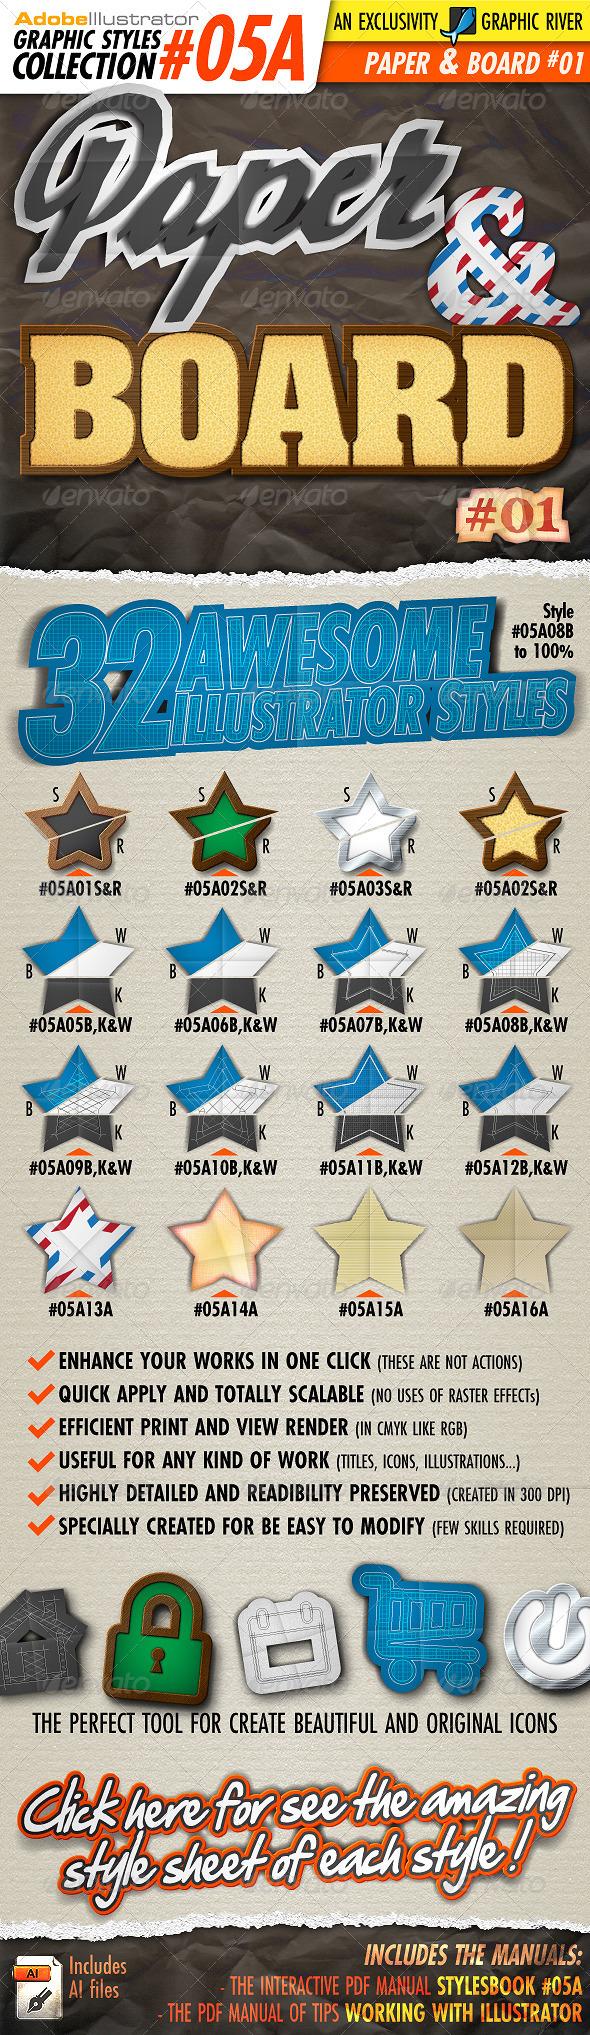 GraphicRiver AI Styles Collection #05A Paper & Board #01 5067566